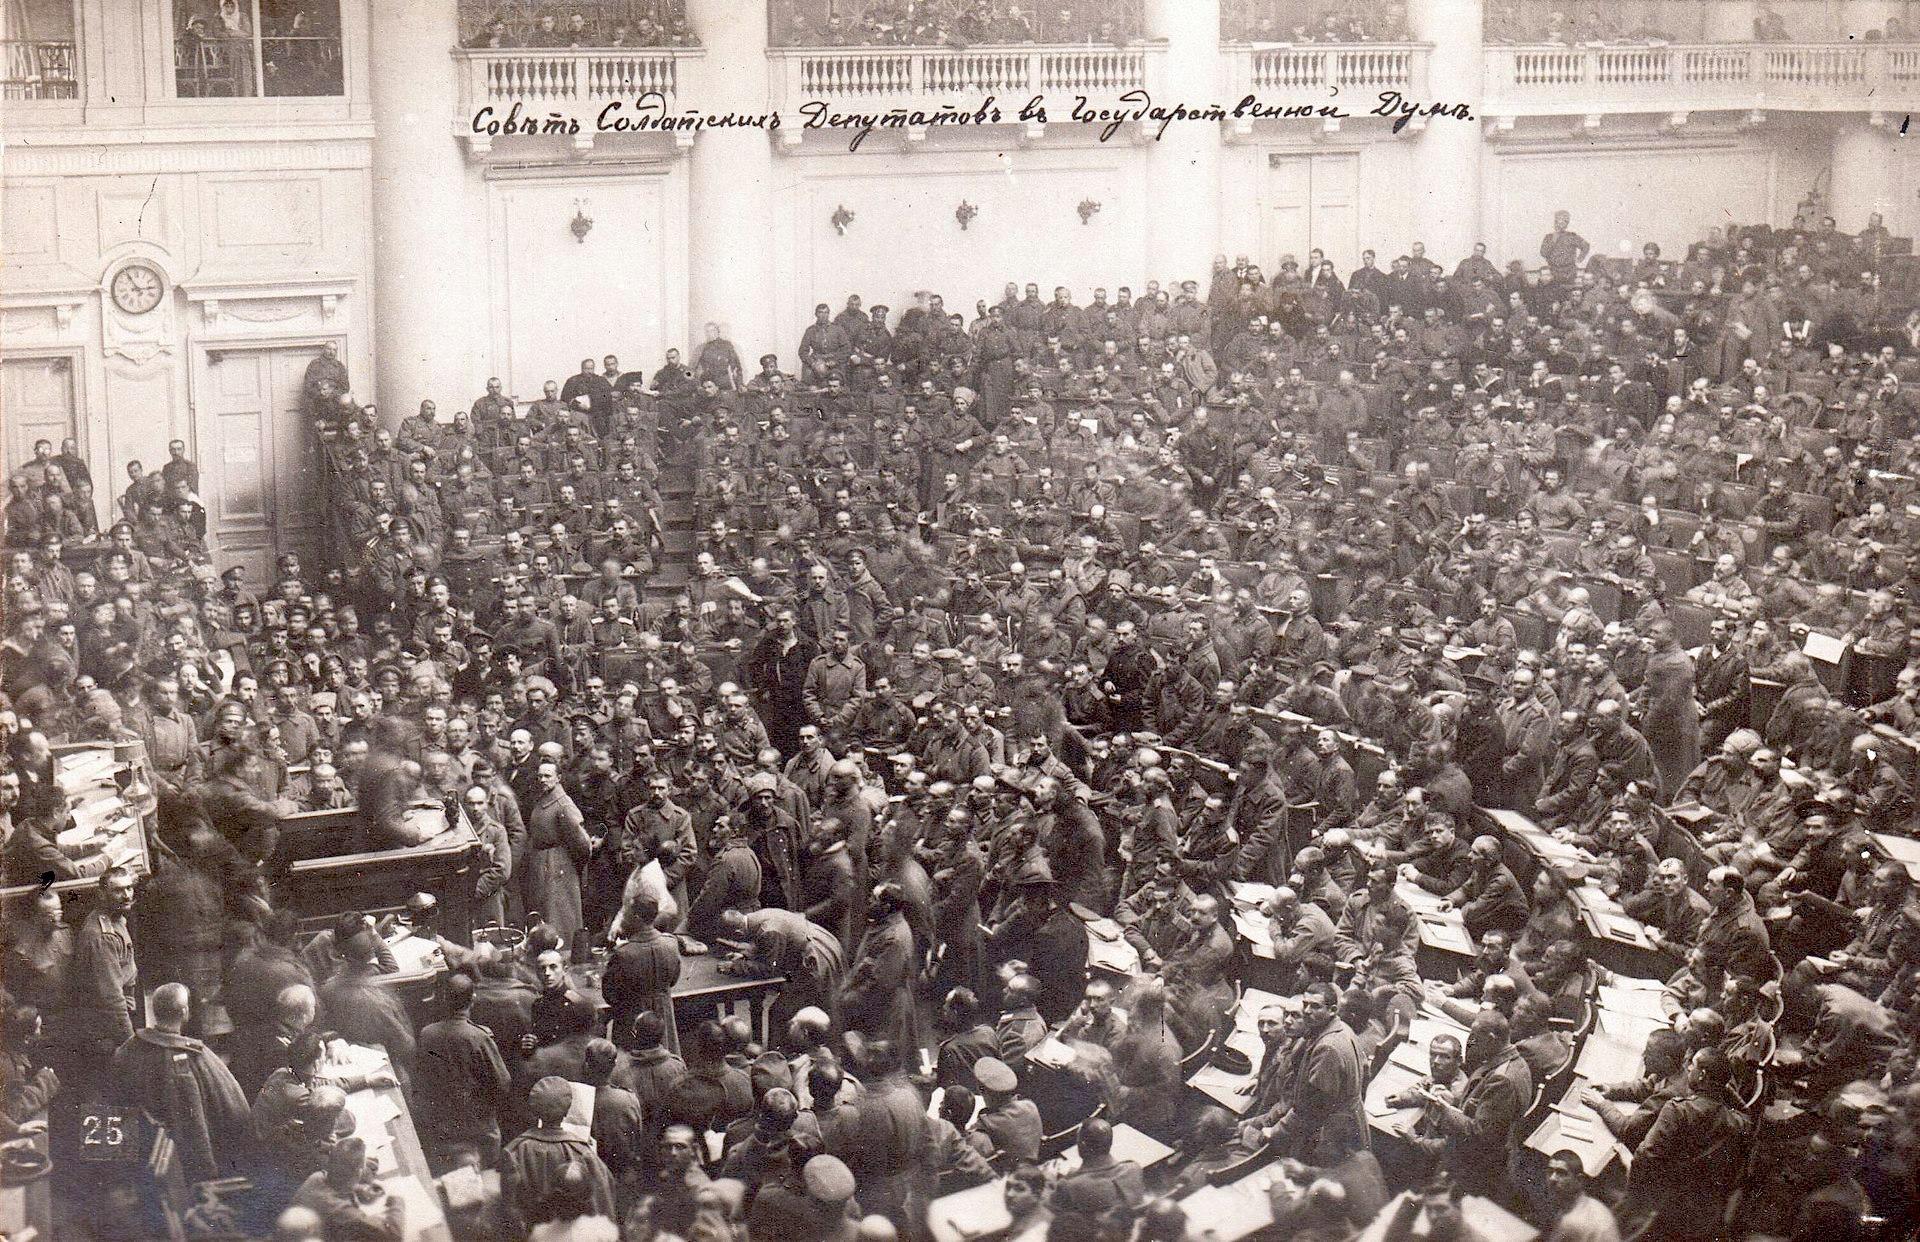 Asamblea del Sóviet de Petrogrado en 1917.